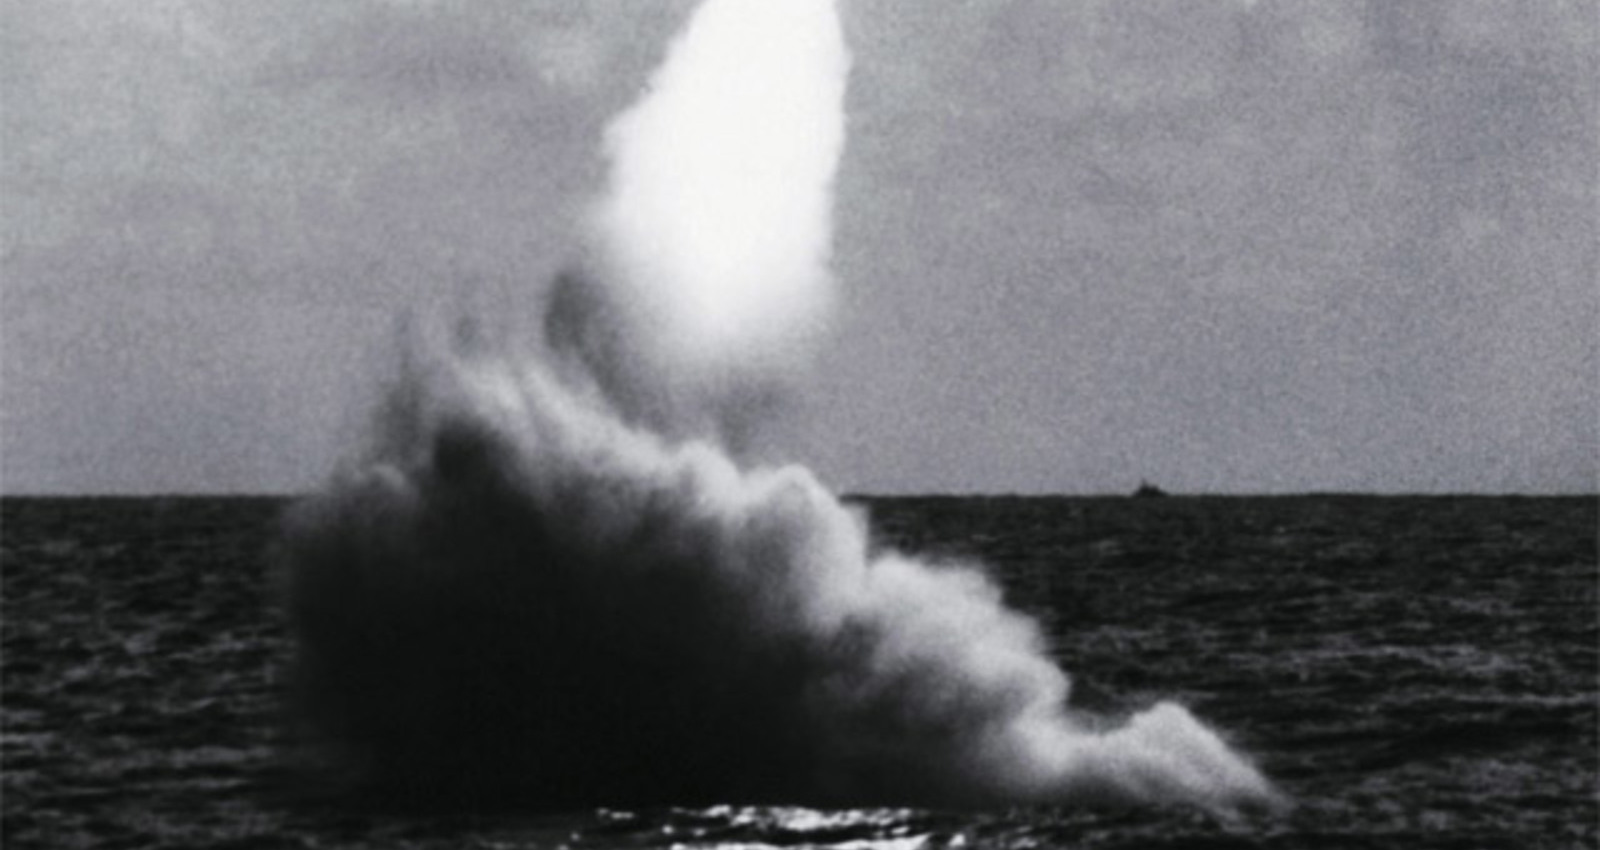 Navy, Monkey, Rocket, Floods, Africa